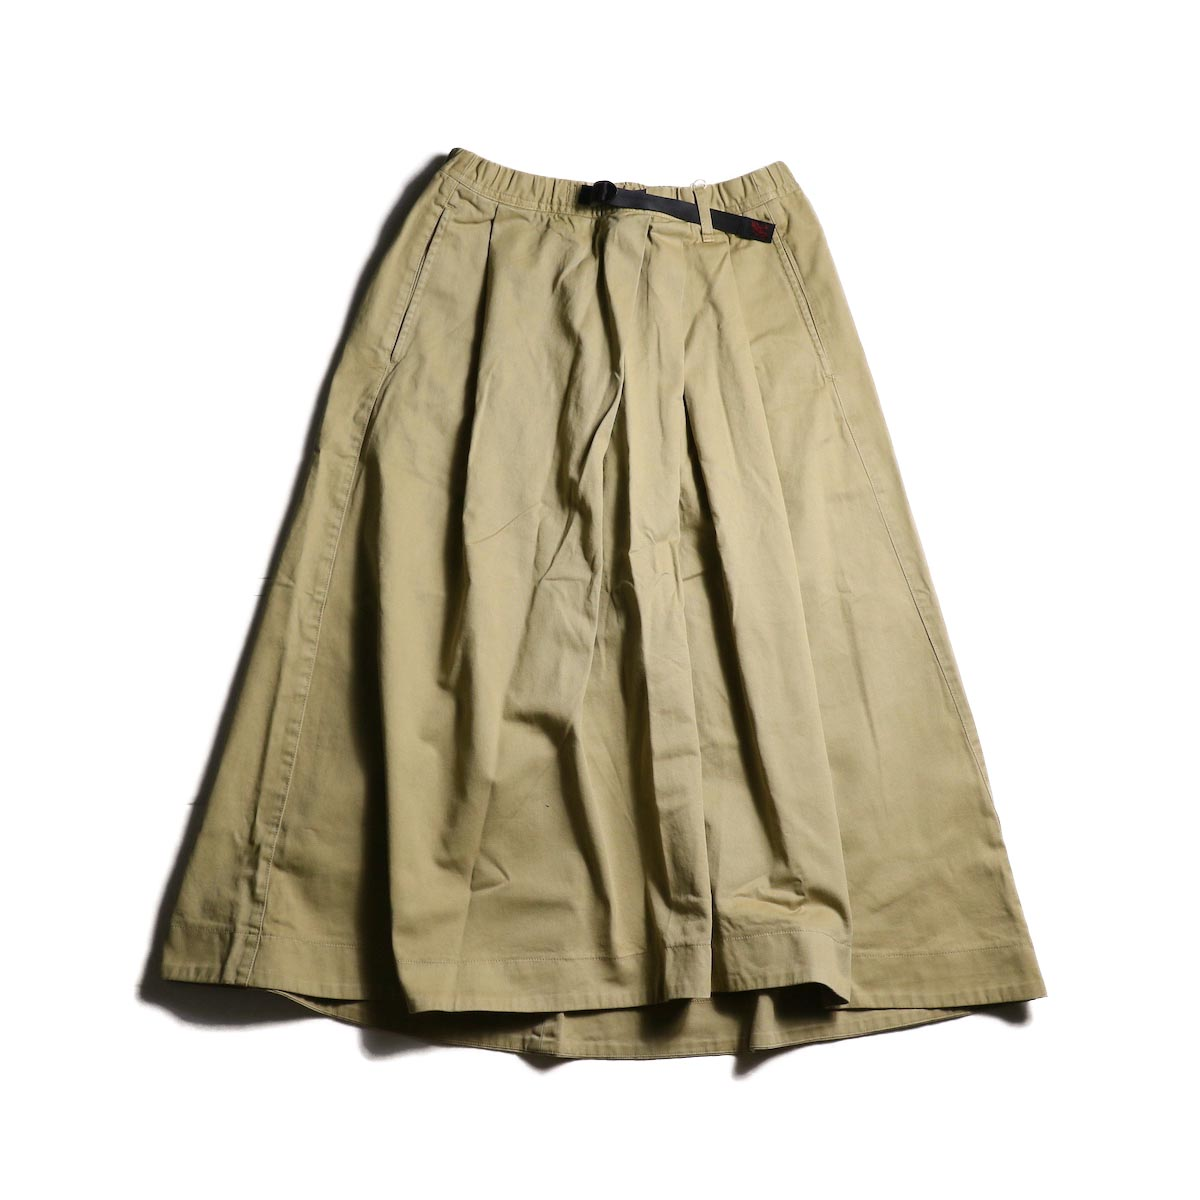 (Ladie's) GRAMICCI / Tale Cut Skirt (Chino)